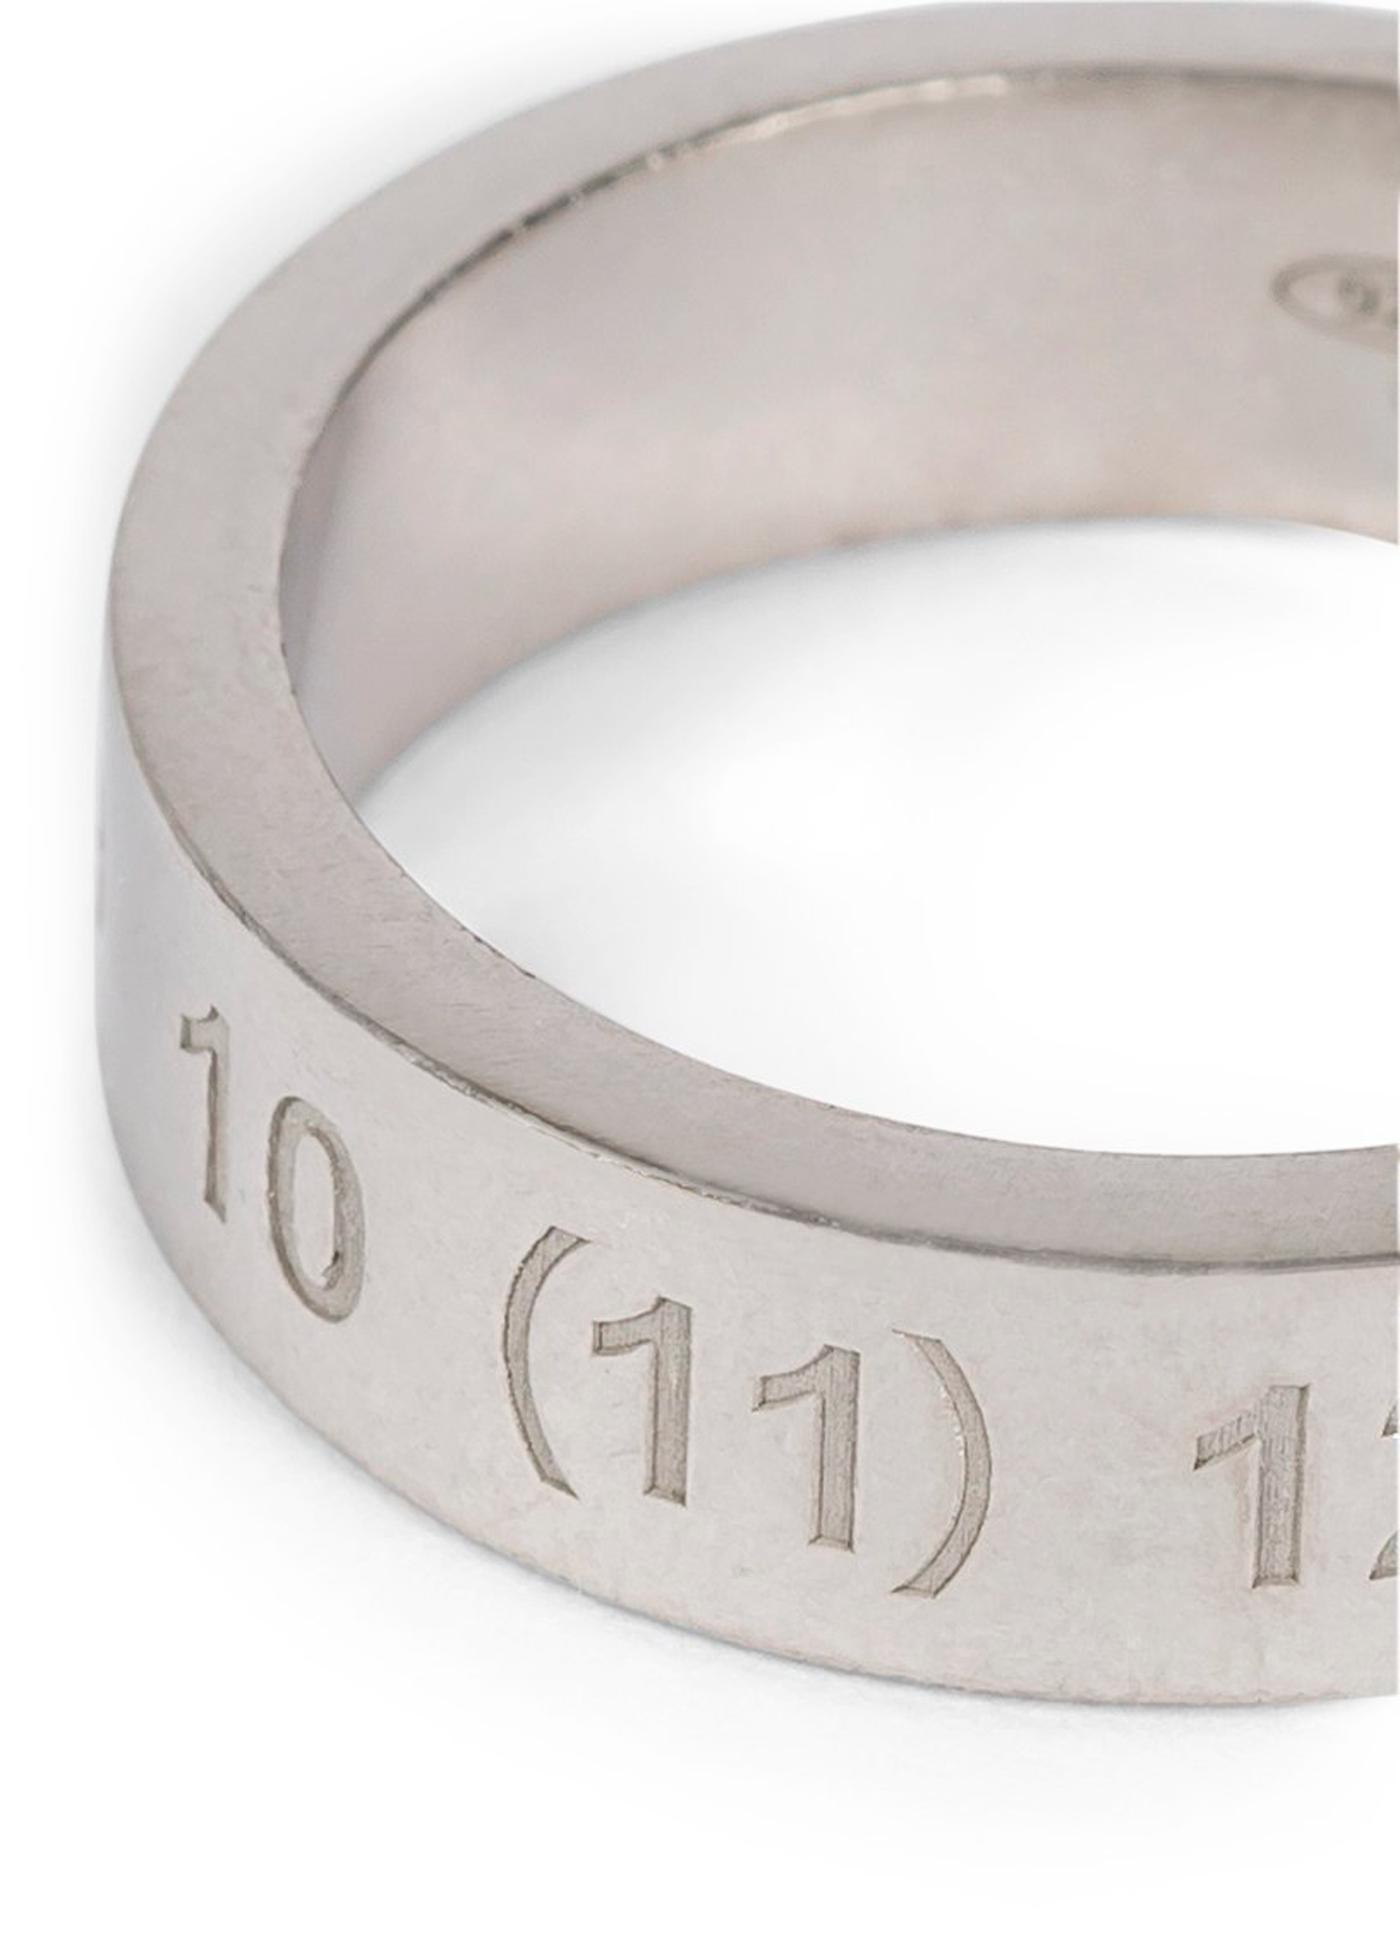 RING image number 1